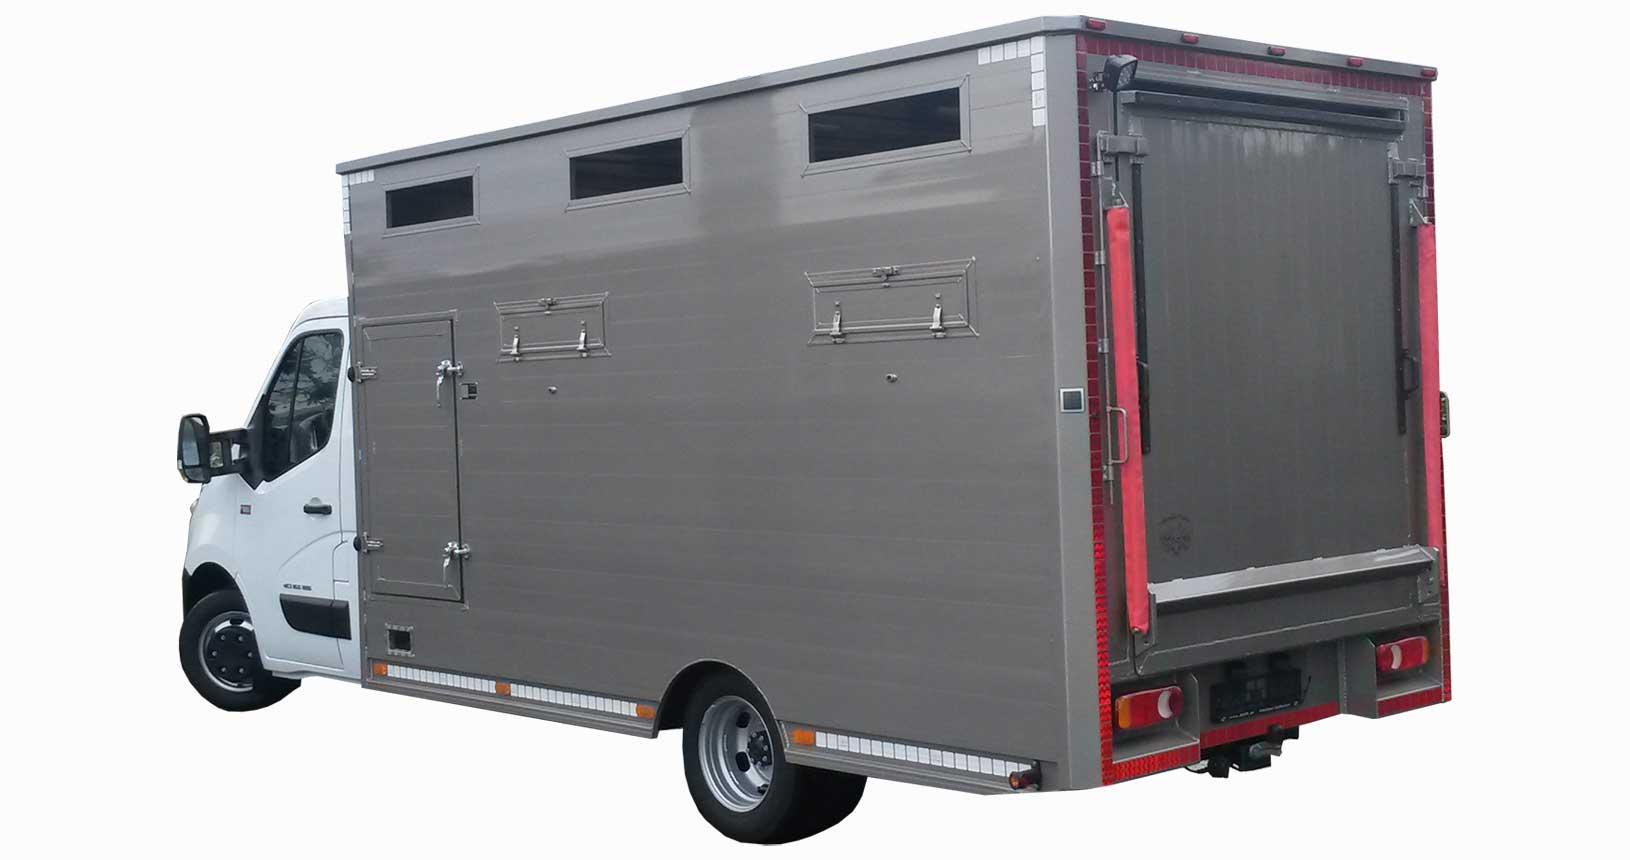 Viehtransporter LKW komplett verkleidet längsseits